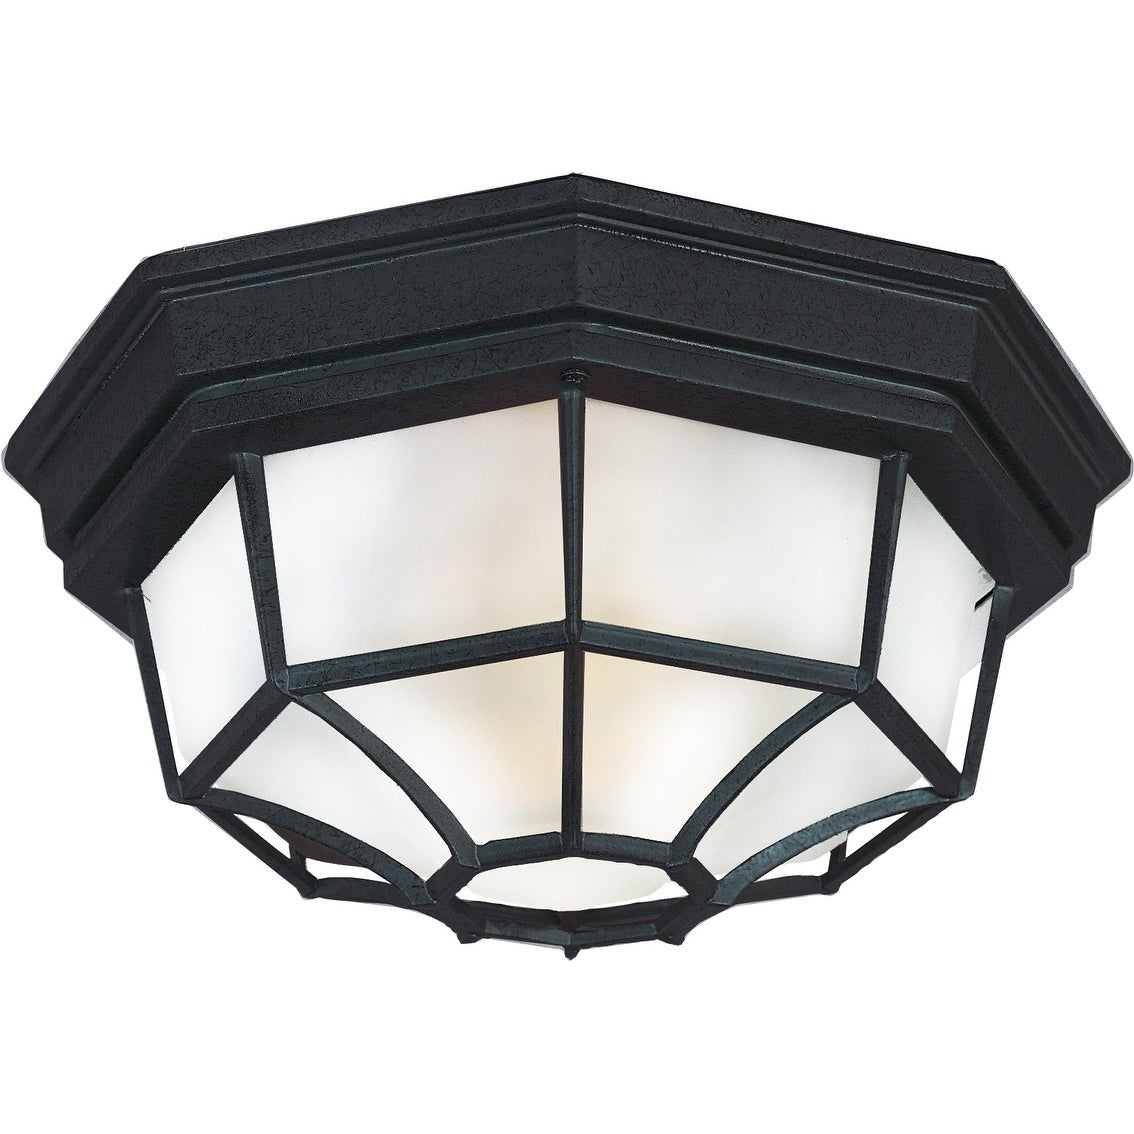 Shop Crown Hill 10 75 Wide Aluminum Outdoor Ceiling Light Overstock 22858514